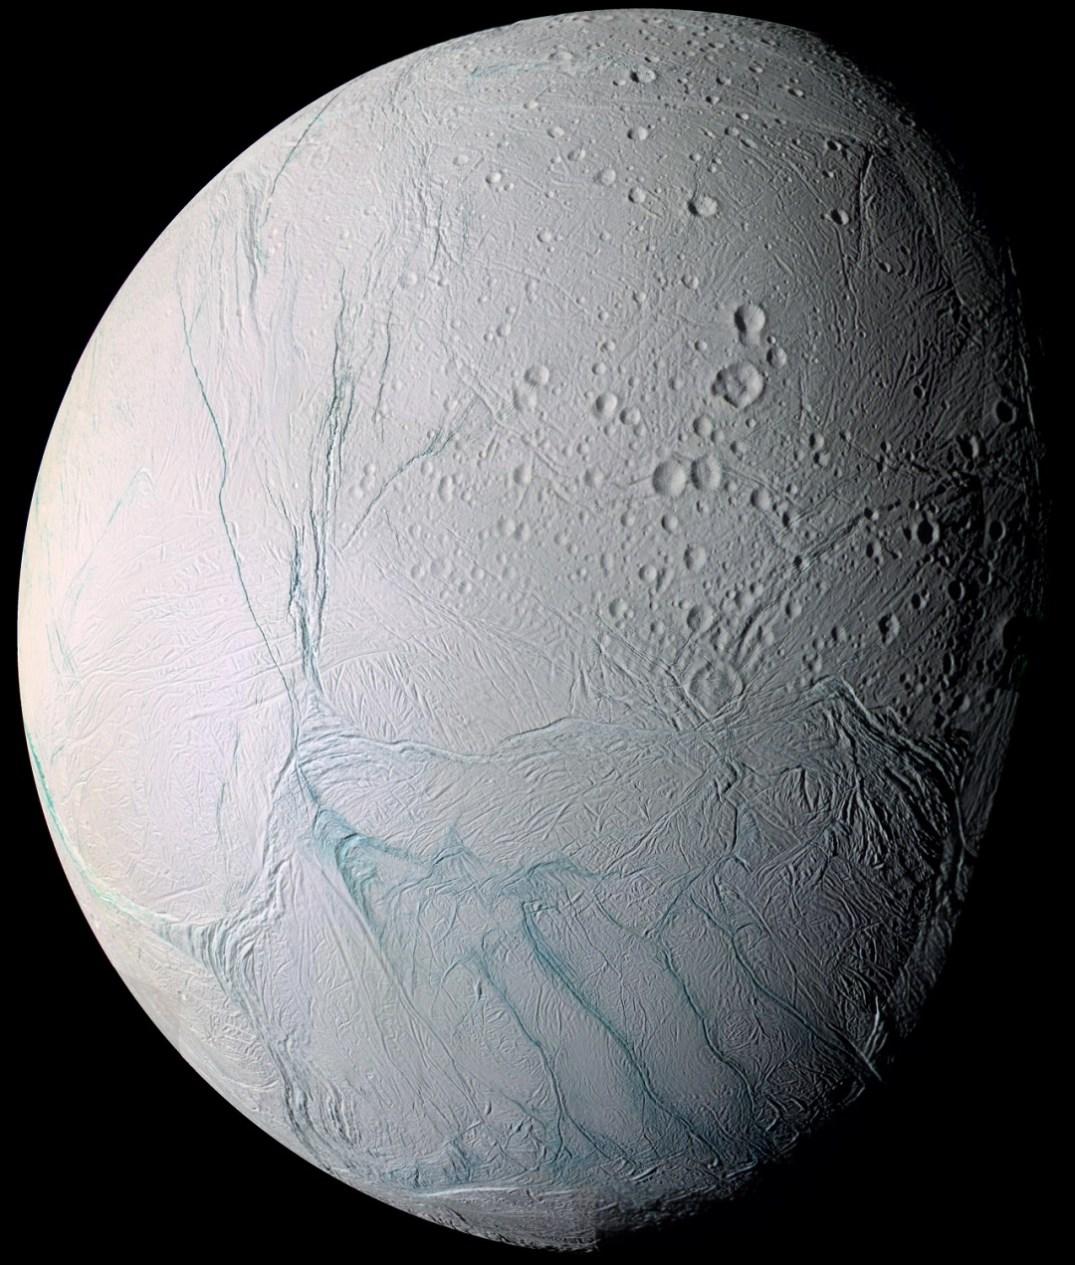 http://sci.esa.int/science-e-media/img/b4/Cassini_Enceladus_mosaic_PIA06254.jpg